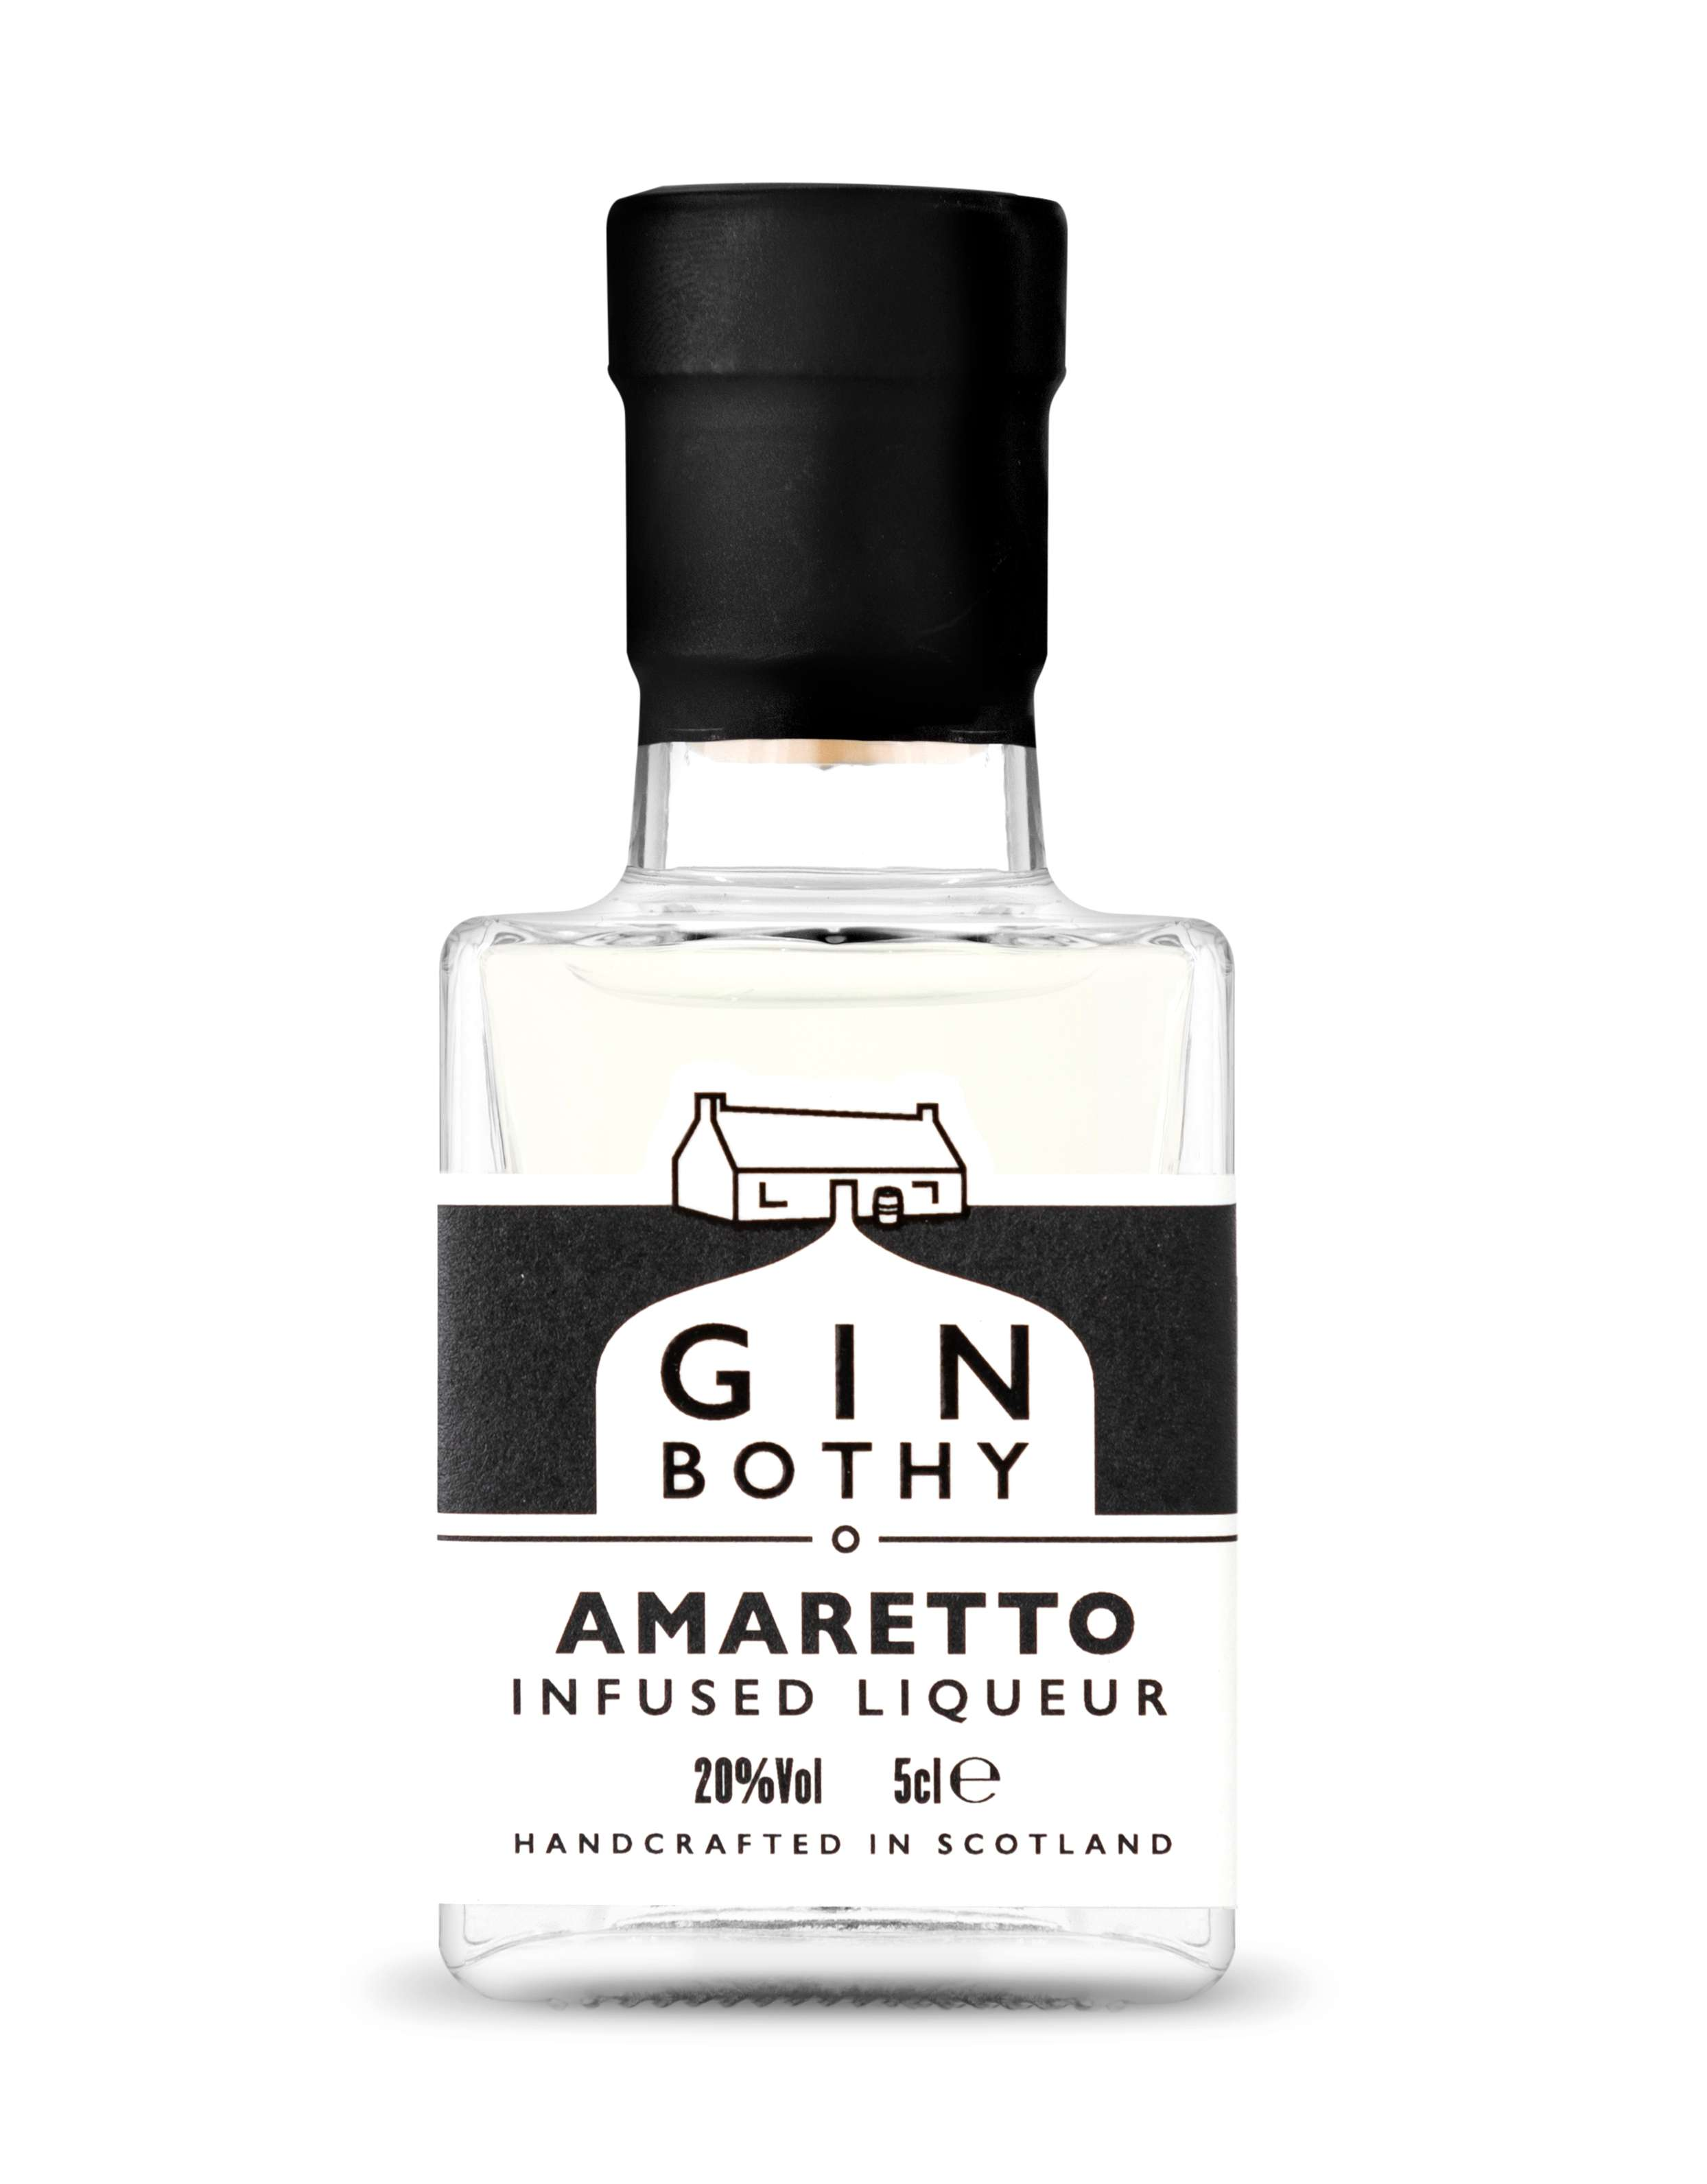 Gin Bothy Amaretto Gins & Gin Liqueurs